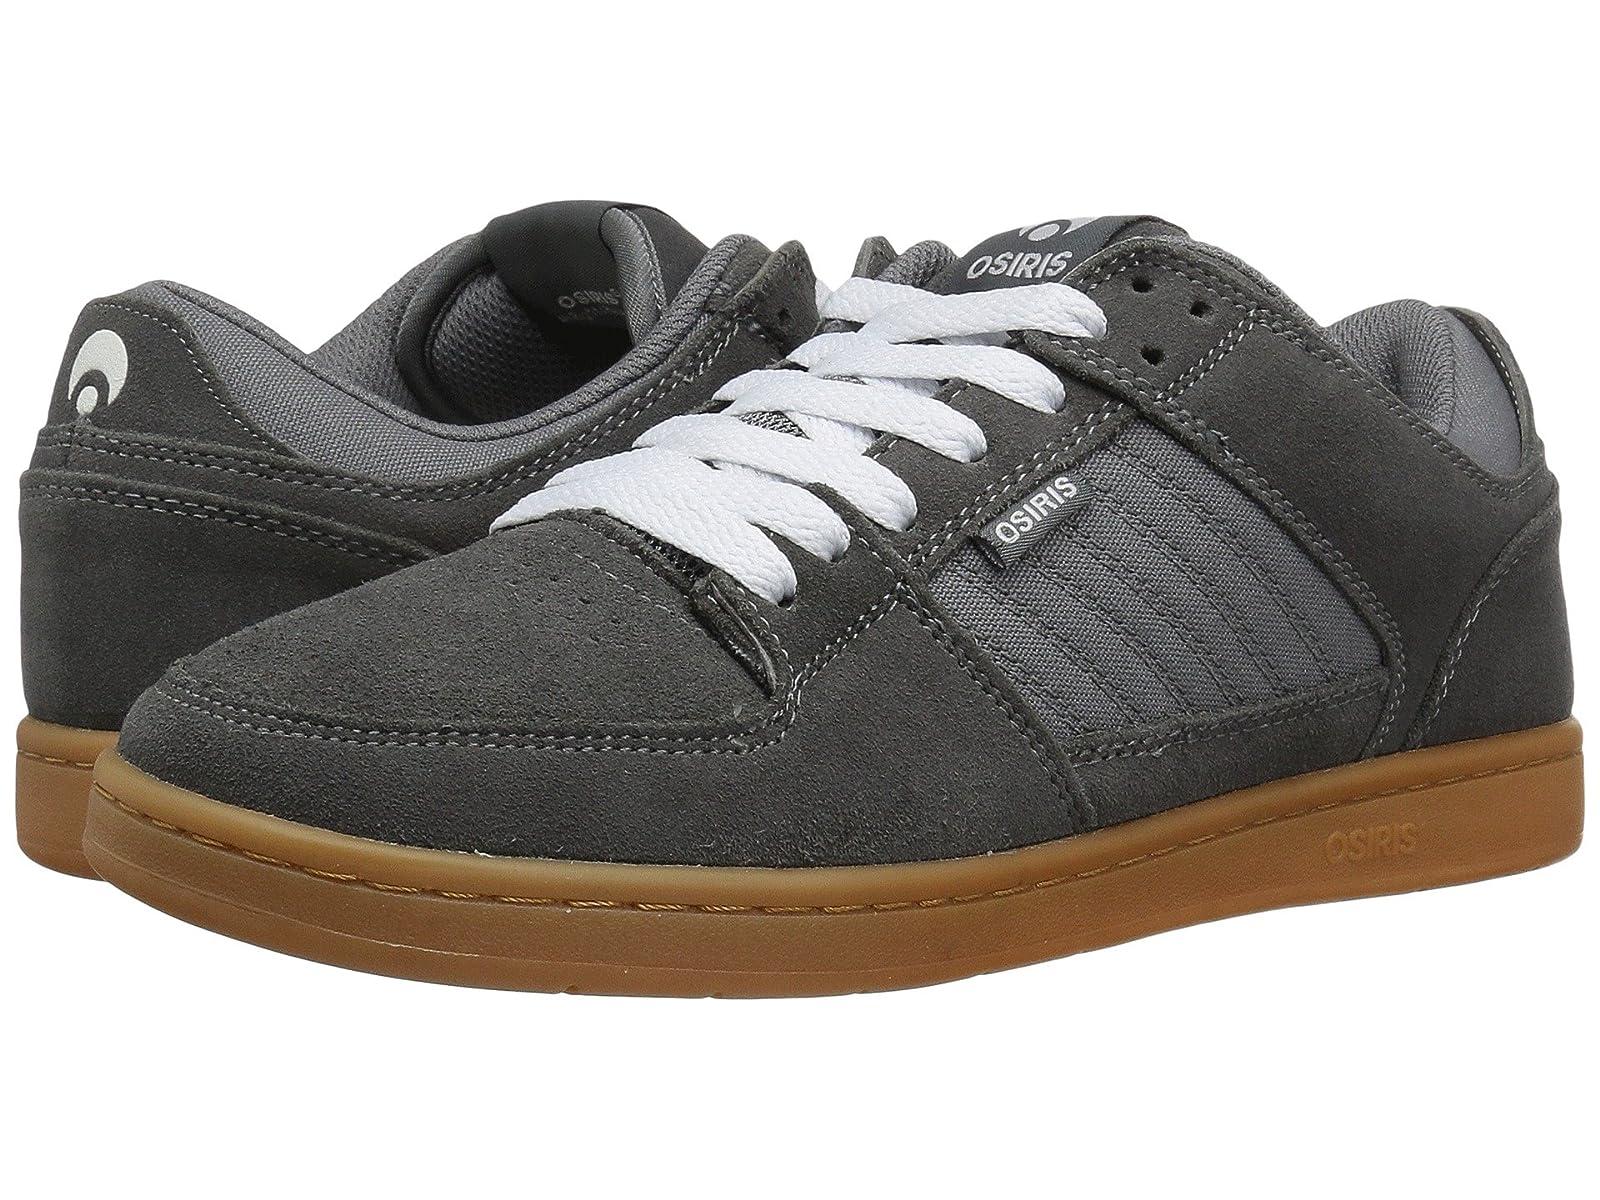 Osiris Protocol SLKAtmospheric grades have affordable shoes